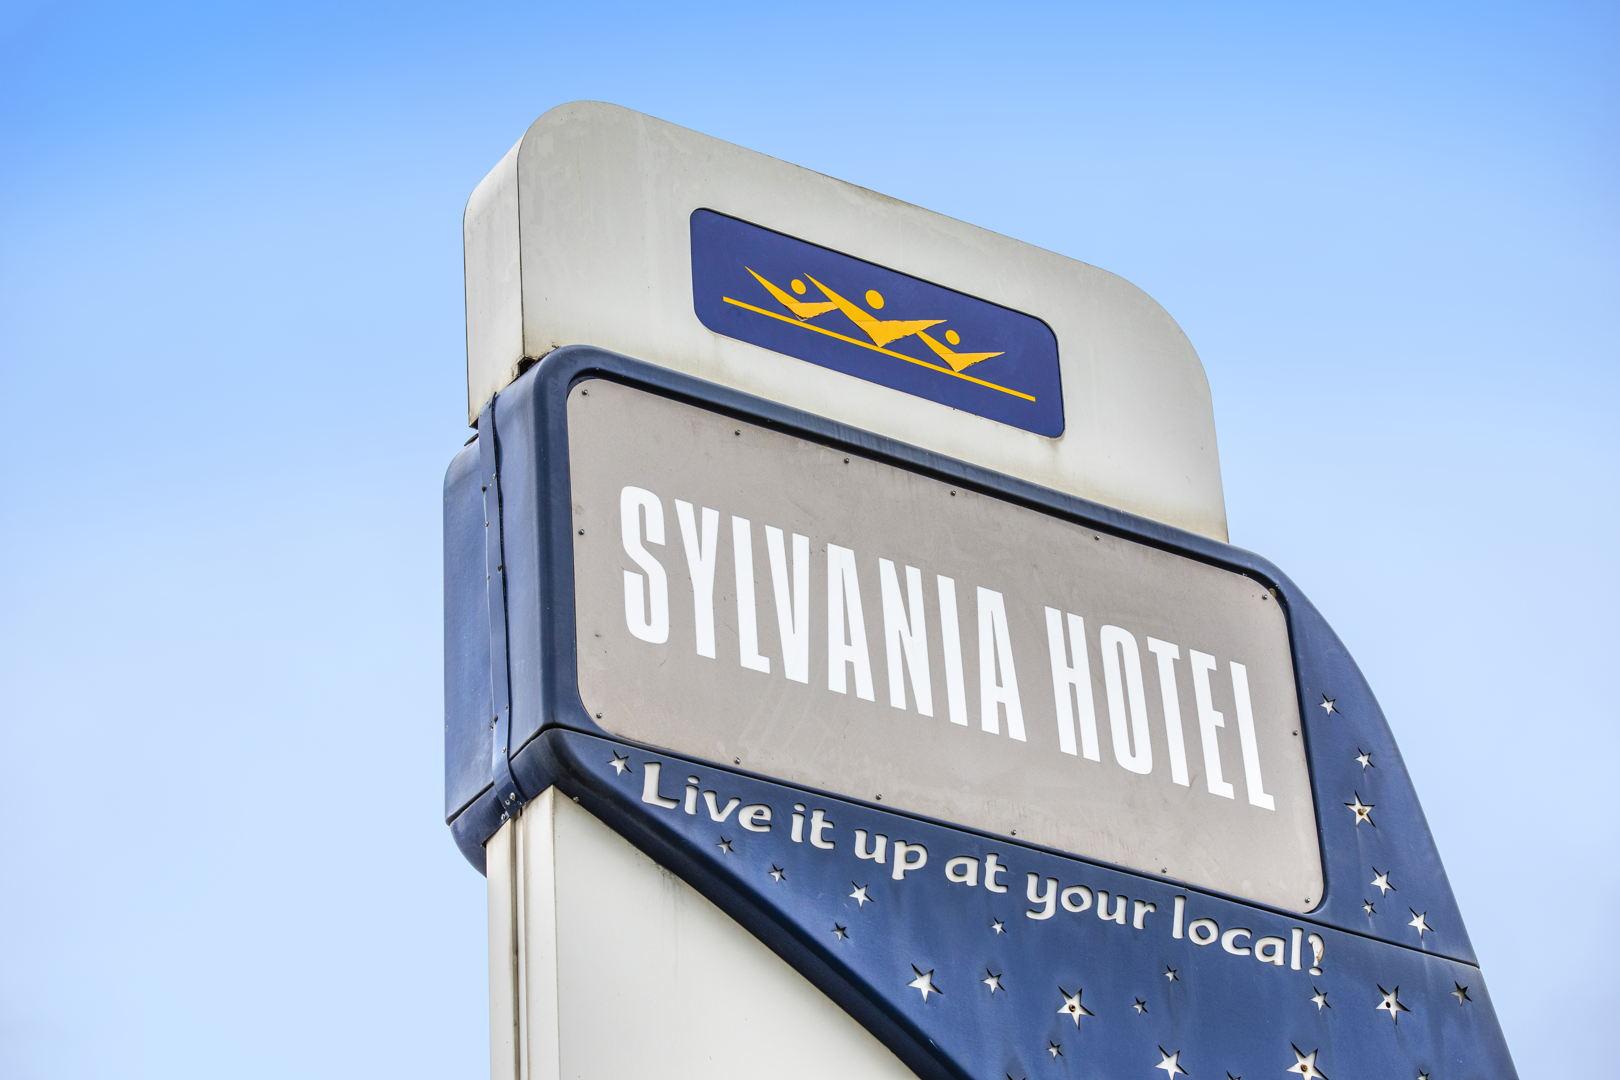 Sylvania Hotel